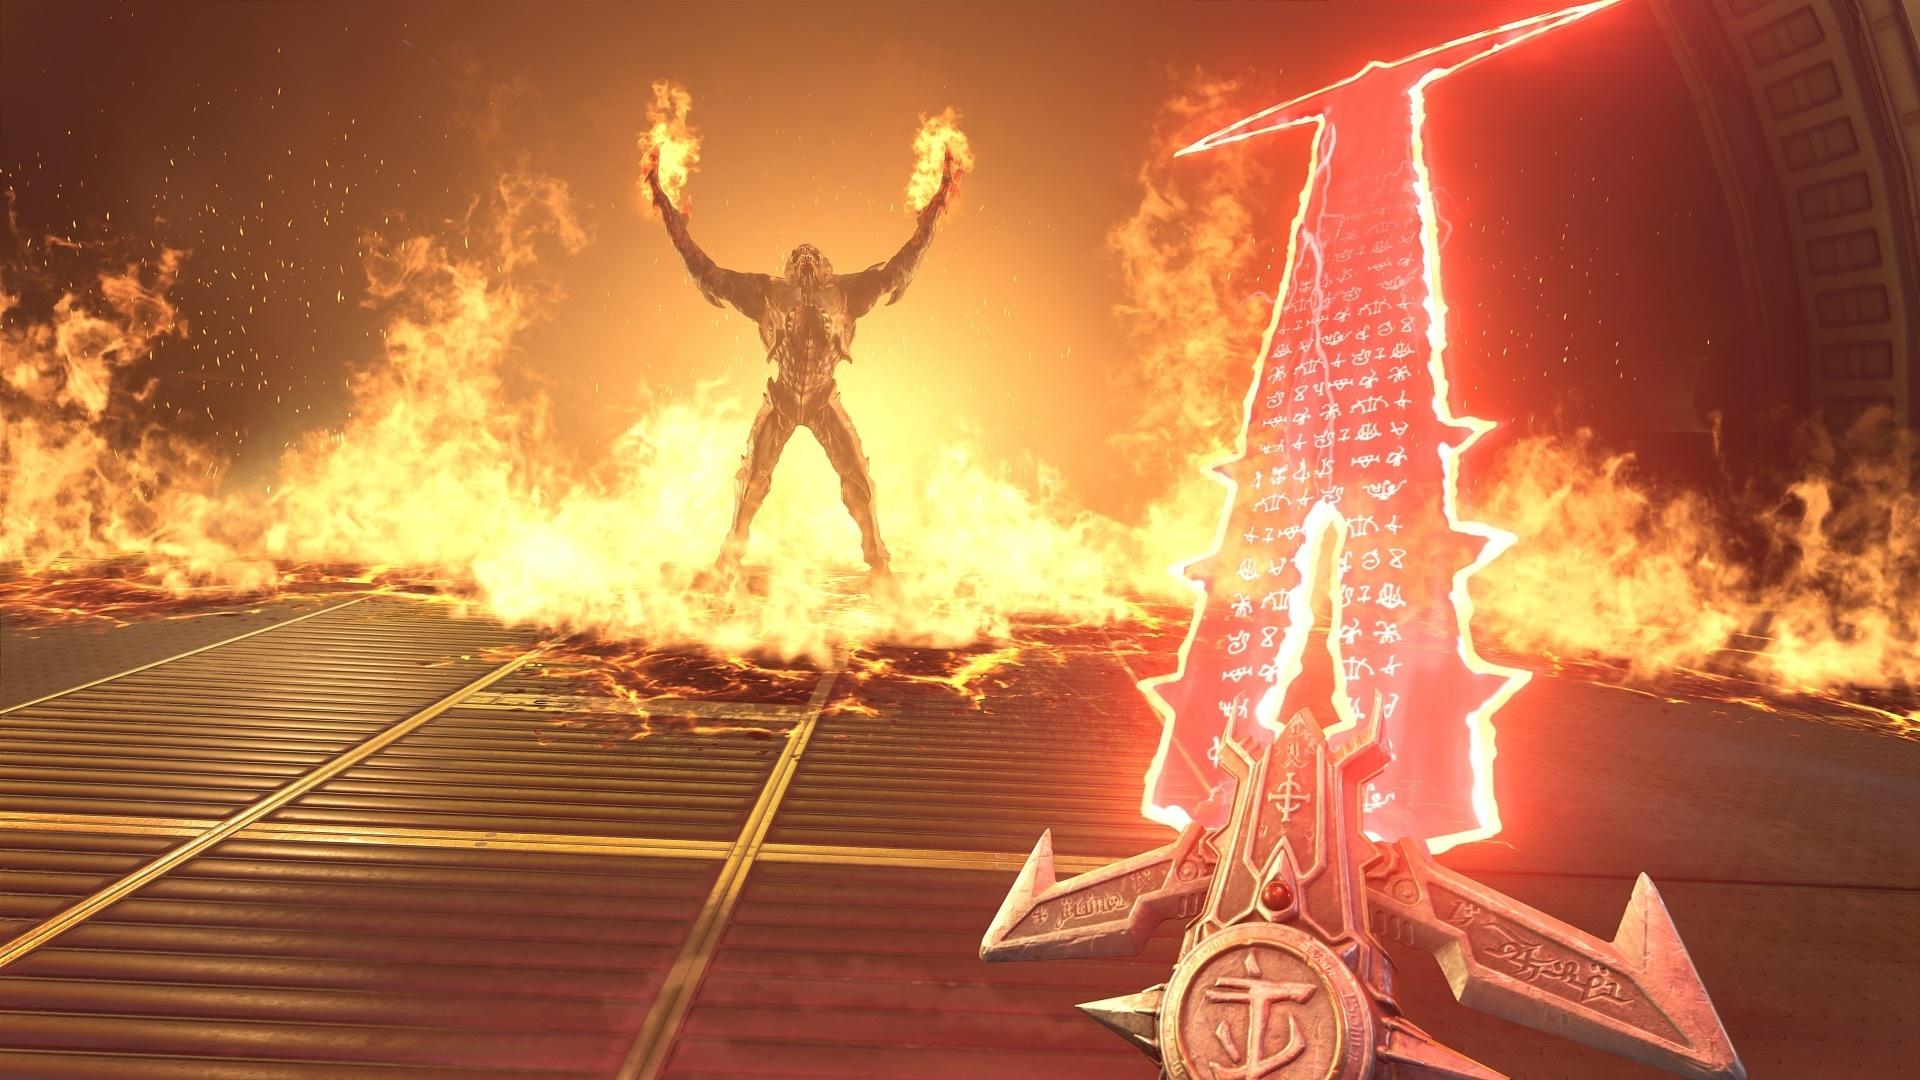 《DOOM:永恆》三段實機演示重點內容詳解